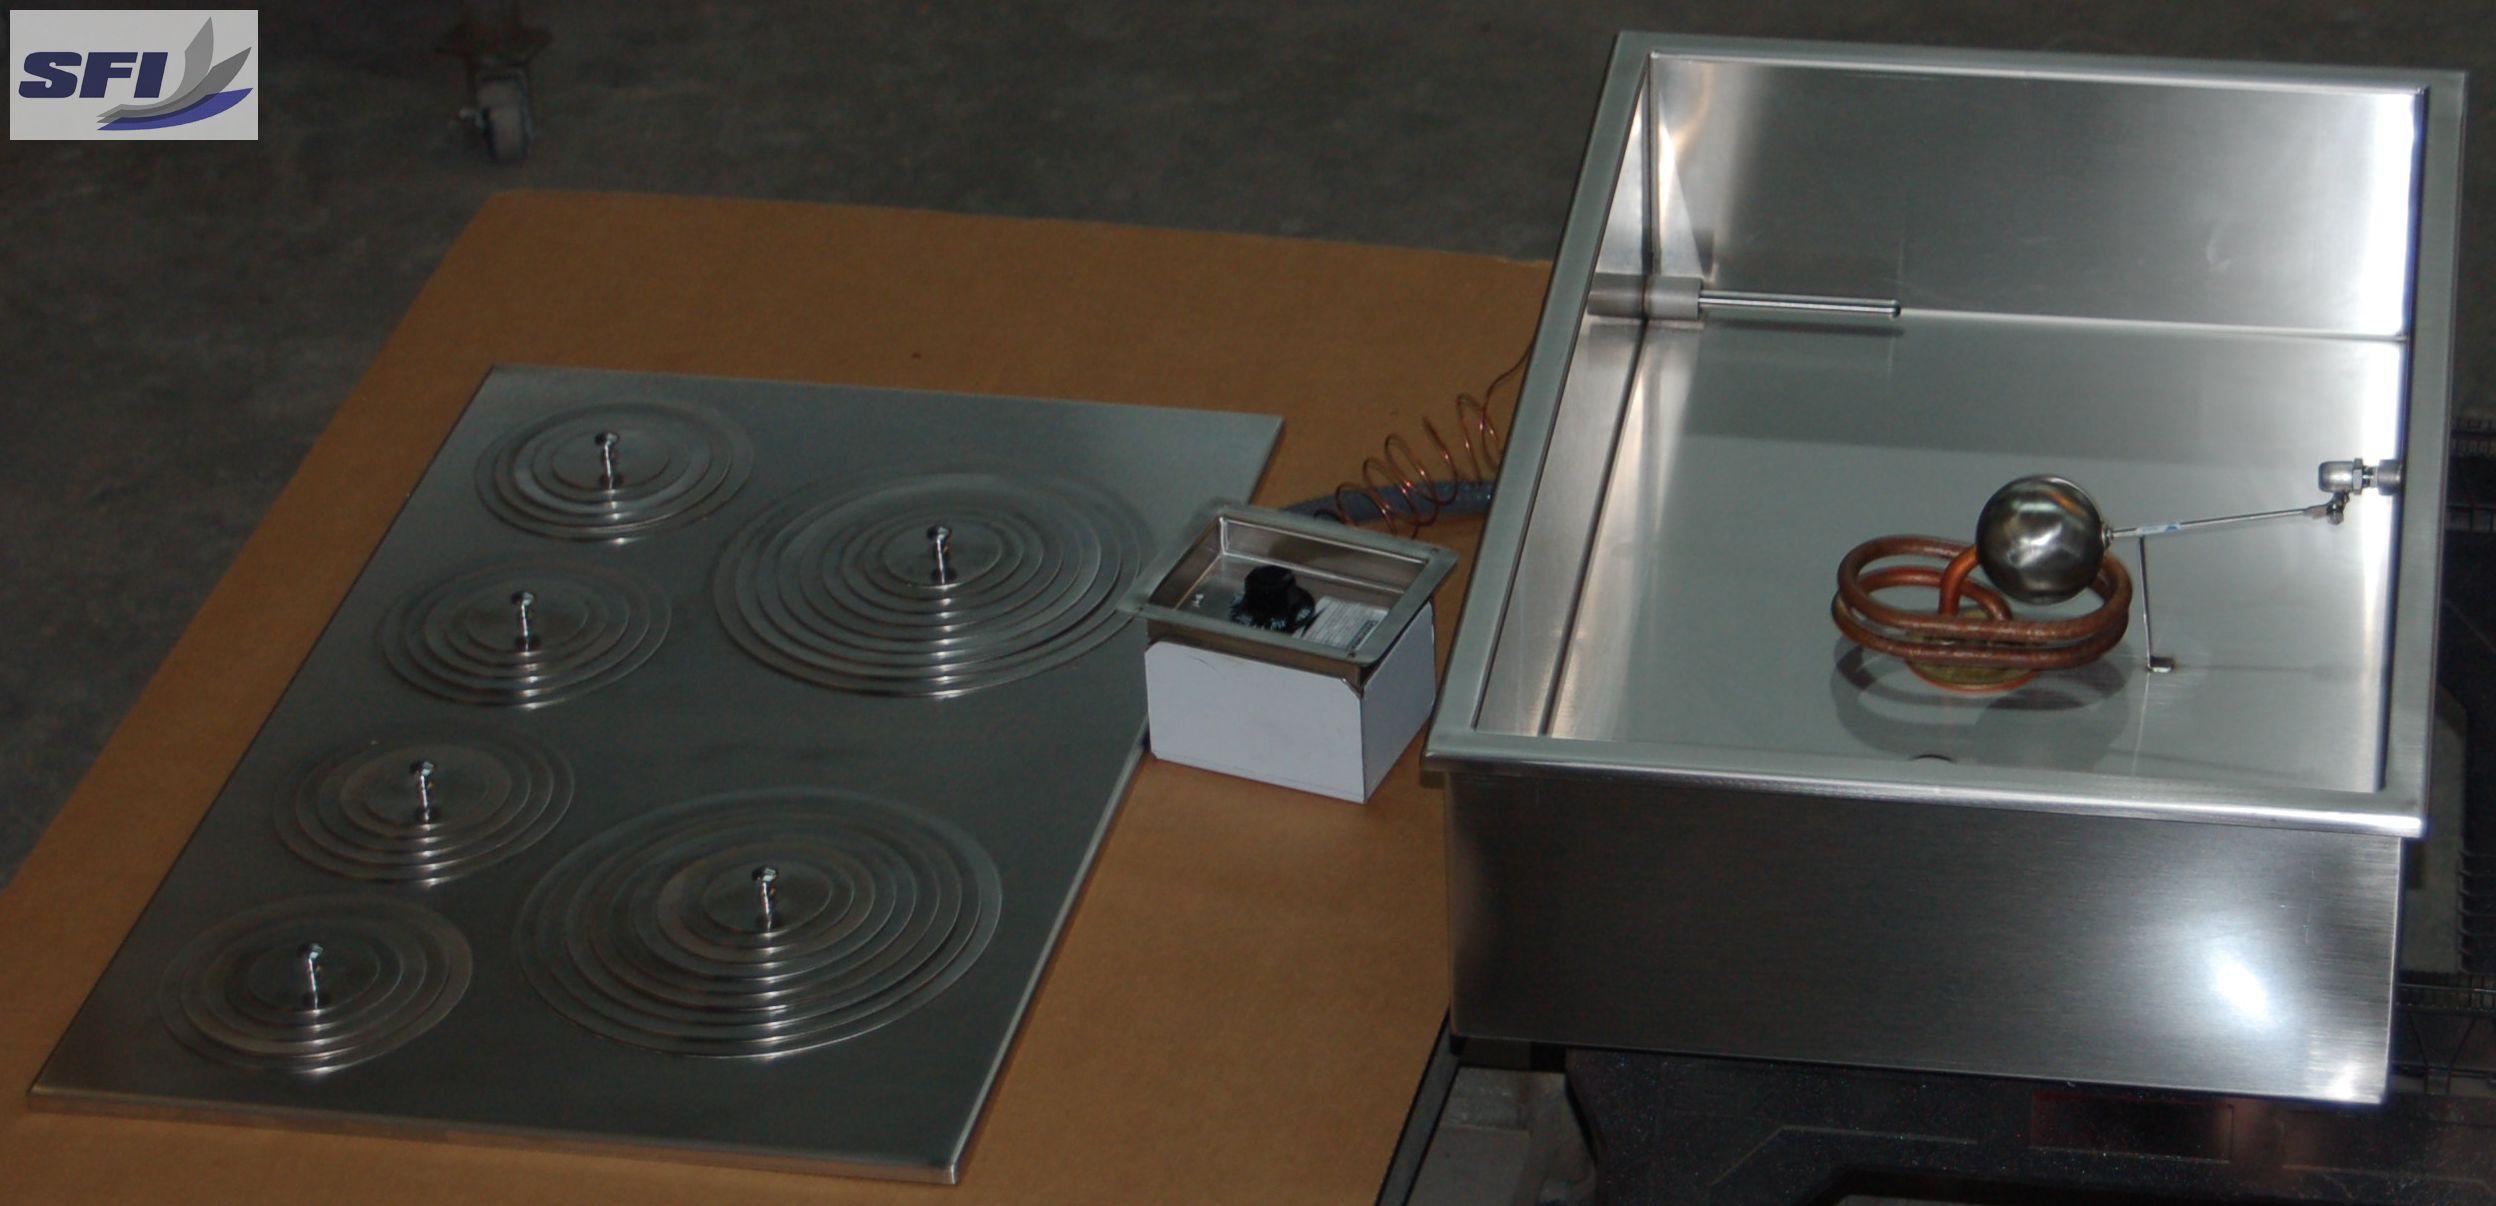 Electric-steam-baths stainless steel electric steam bath